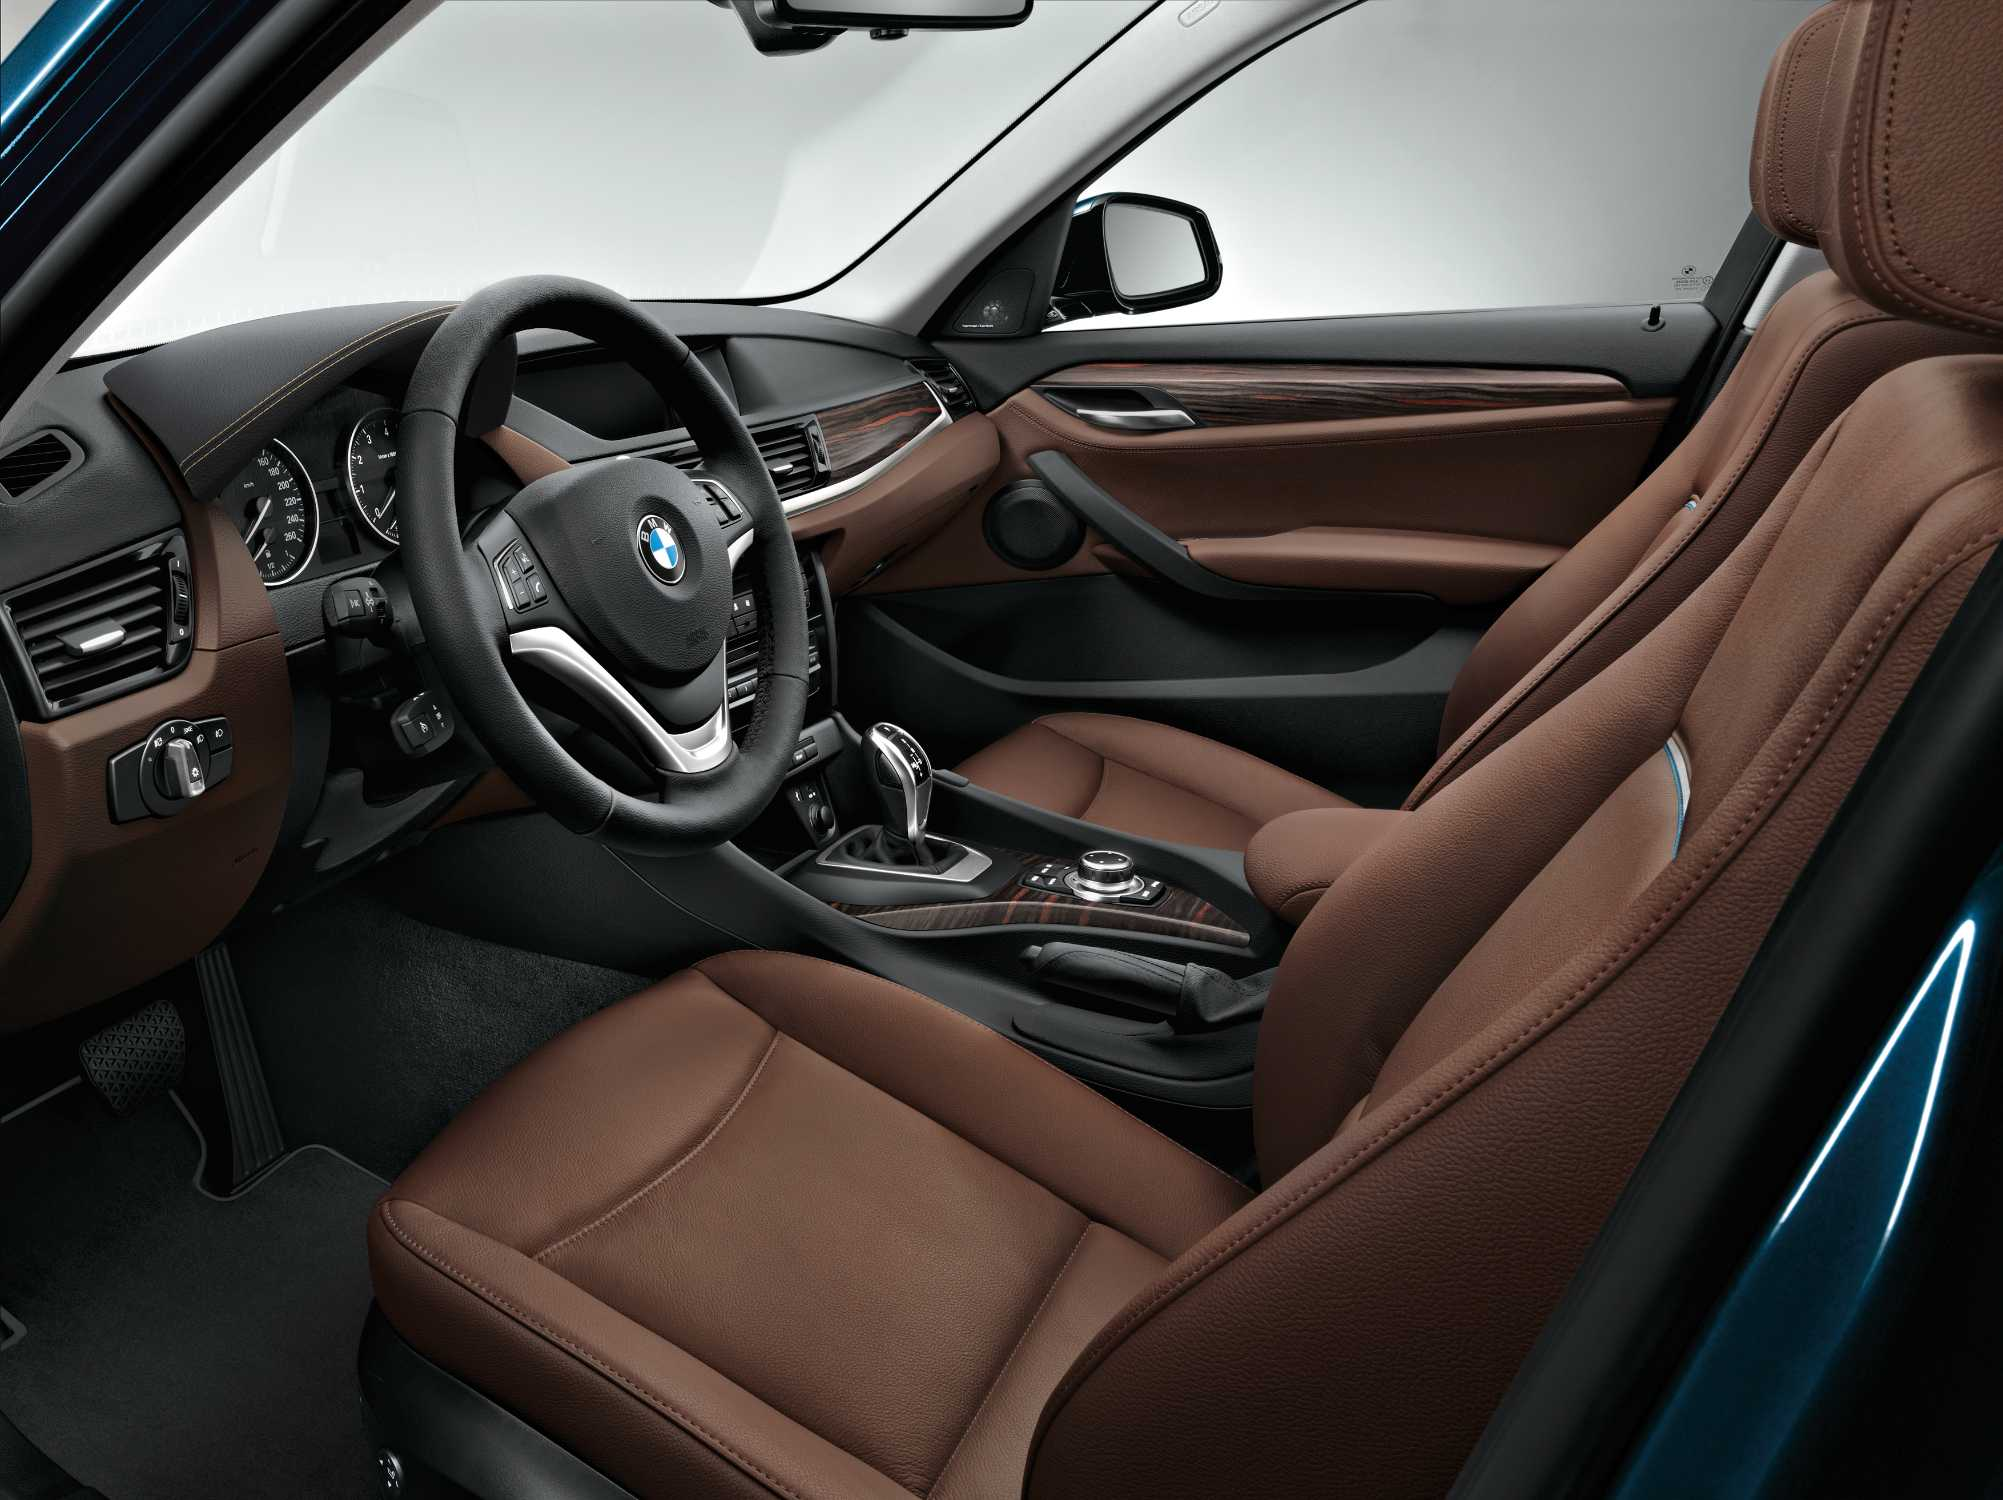 Car interior piping - Bmw X1 Xdrive28i Interior Nevada Leather Terra With Grey Petrol Piping Interior Trim Fineline Bay Matt Wood Xline 12 2013